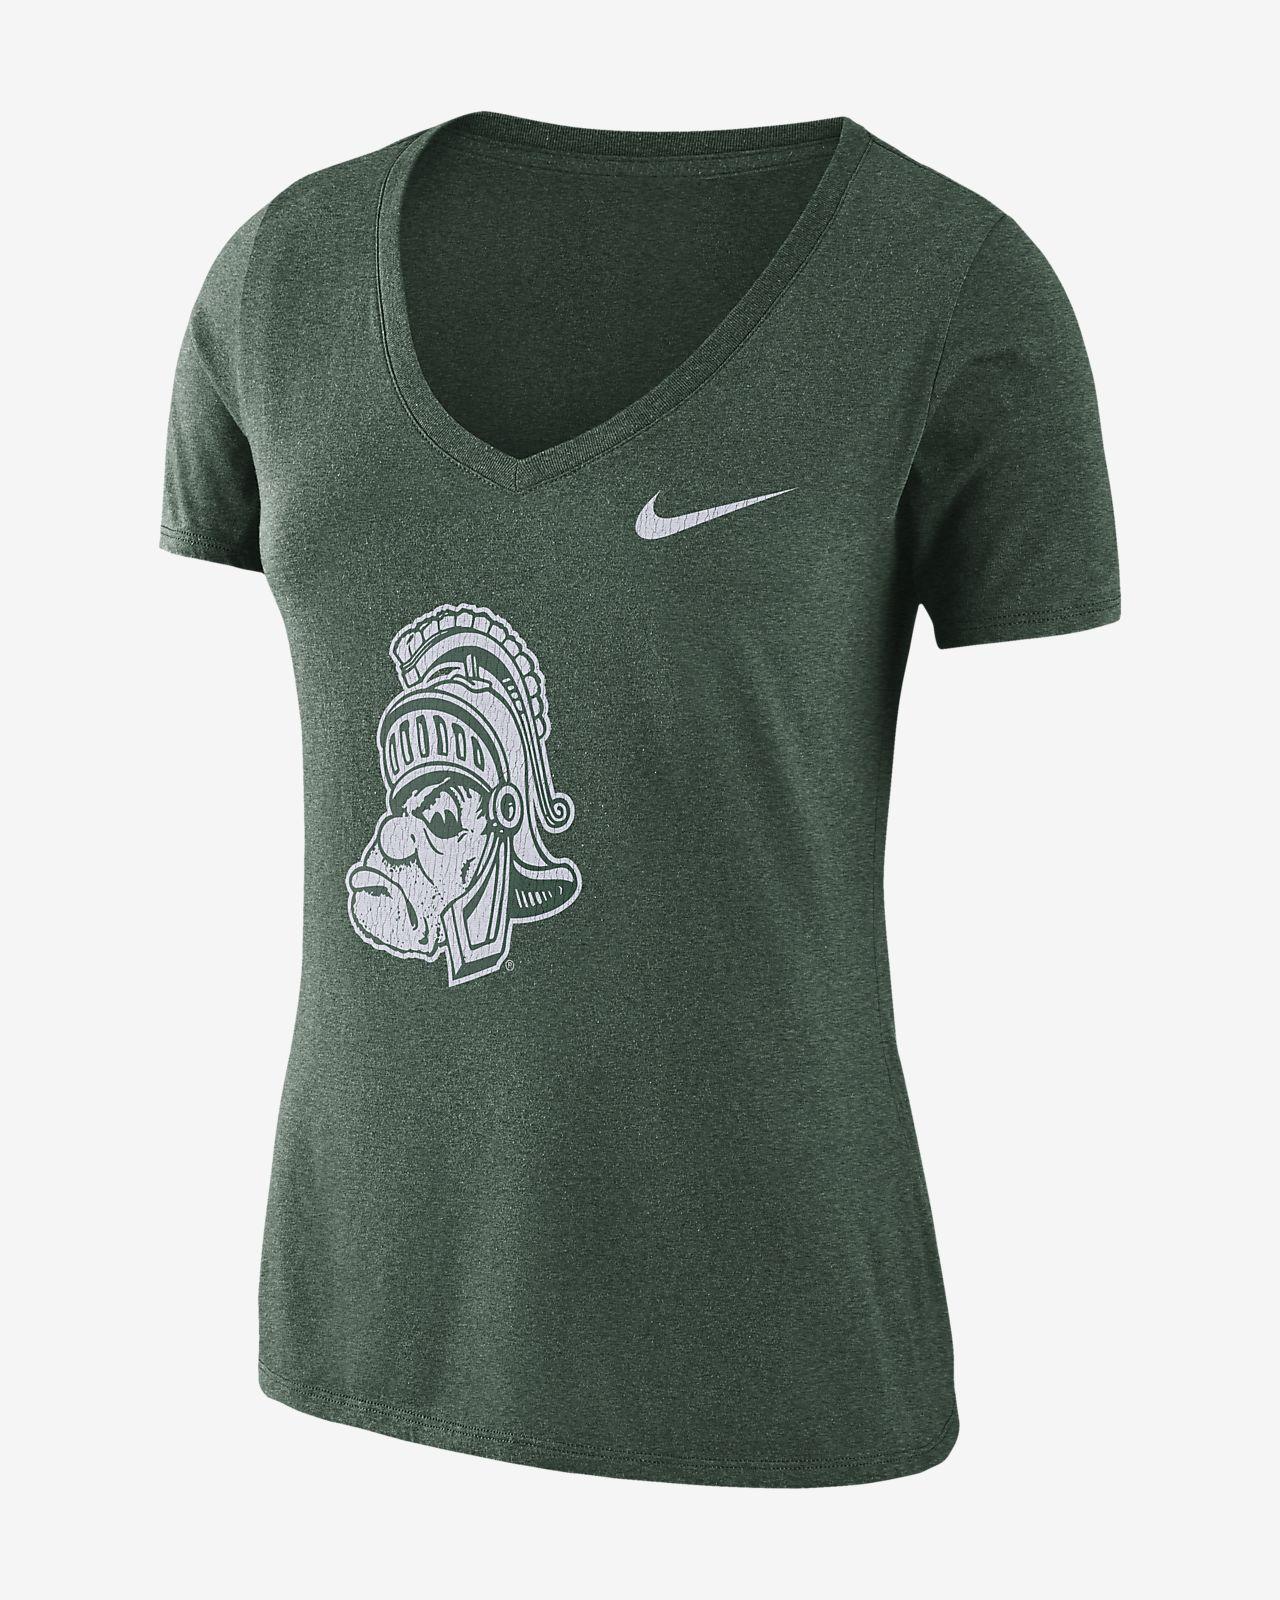 Nike College Tri-Blend Mid-V Vault Logo (Michigan State) Women's T-Shirt